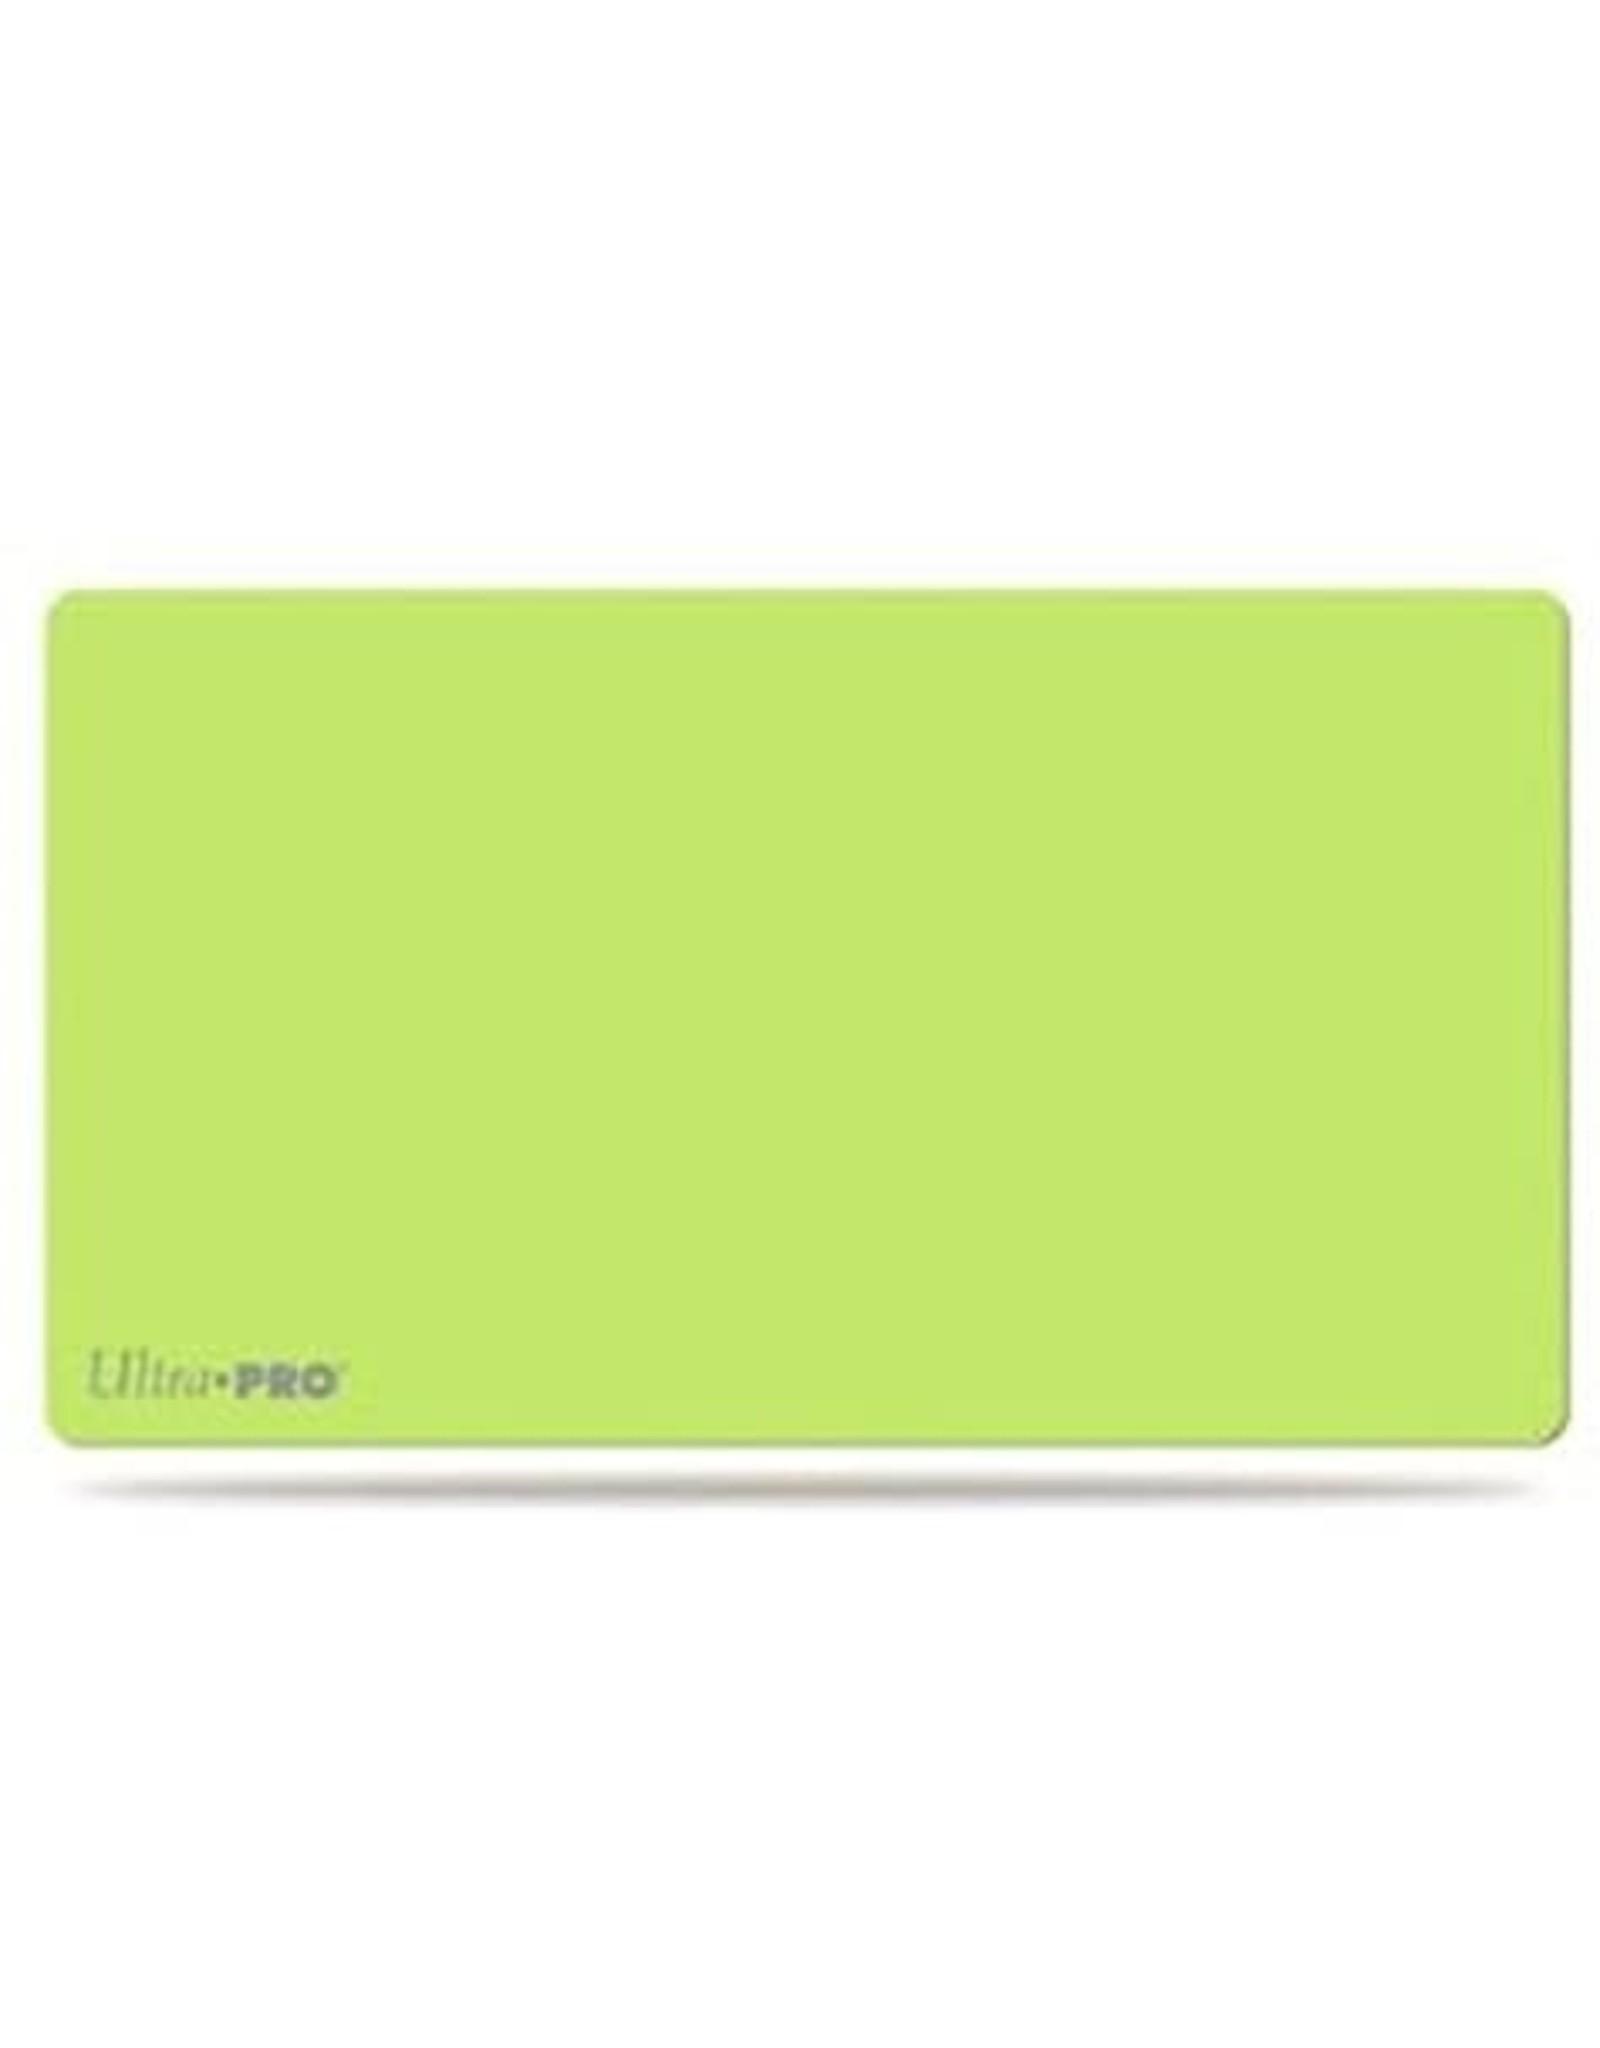 Ultra Pro Ultra Pro Artist Playmat: Solid Lime Green